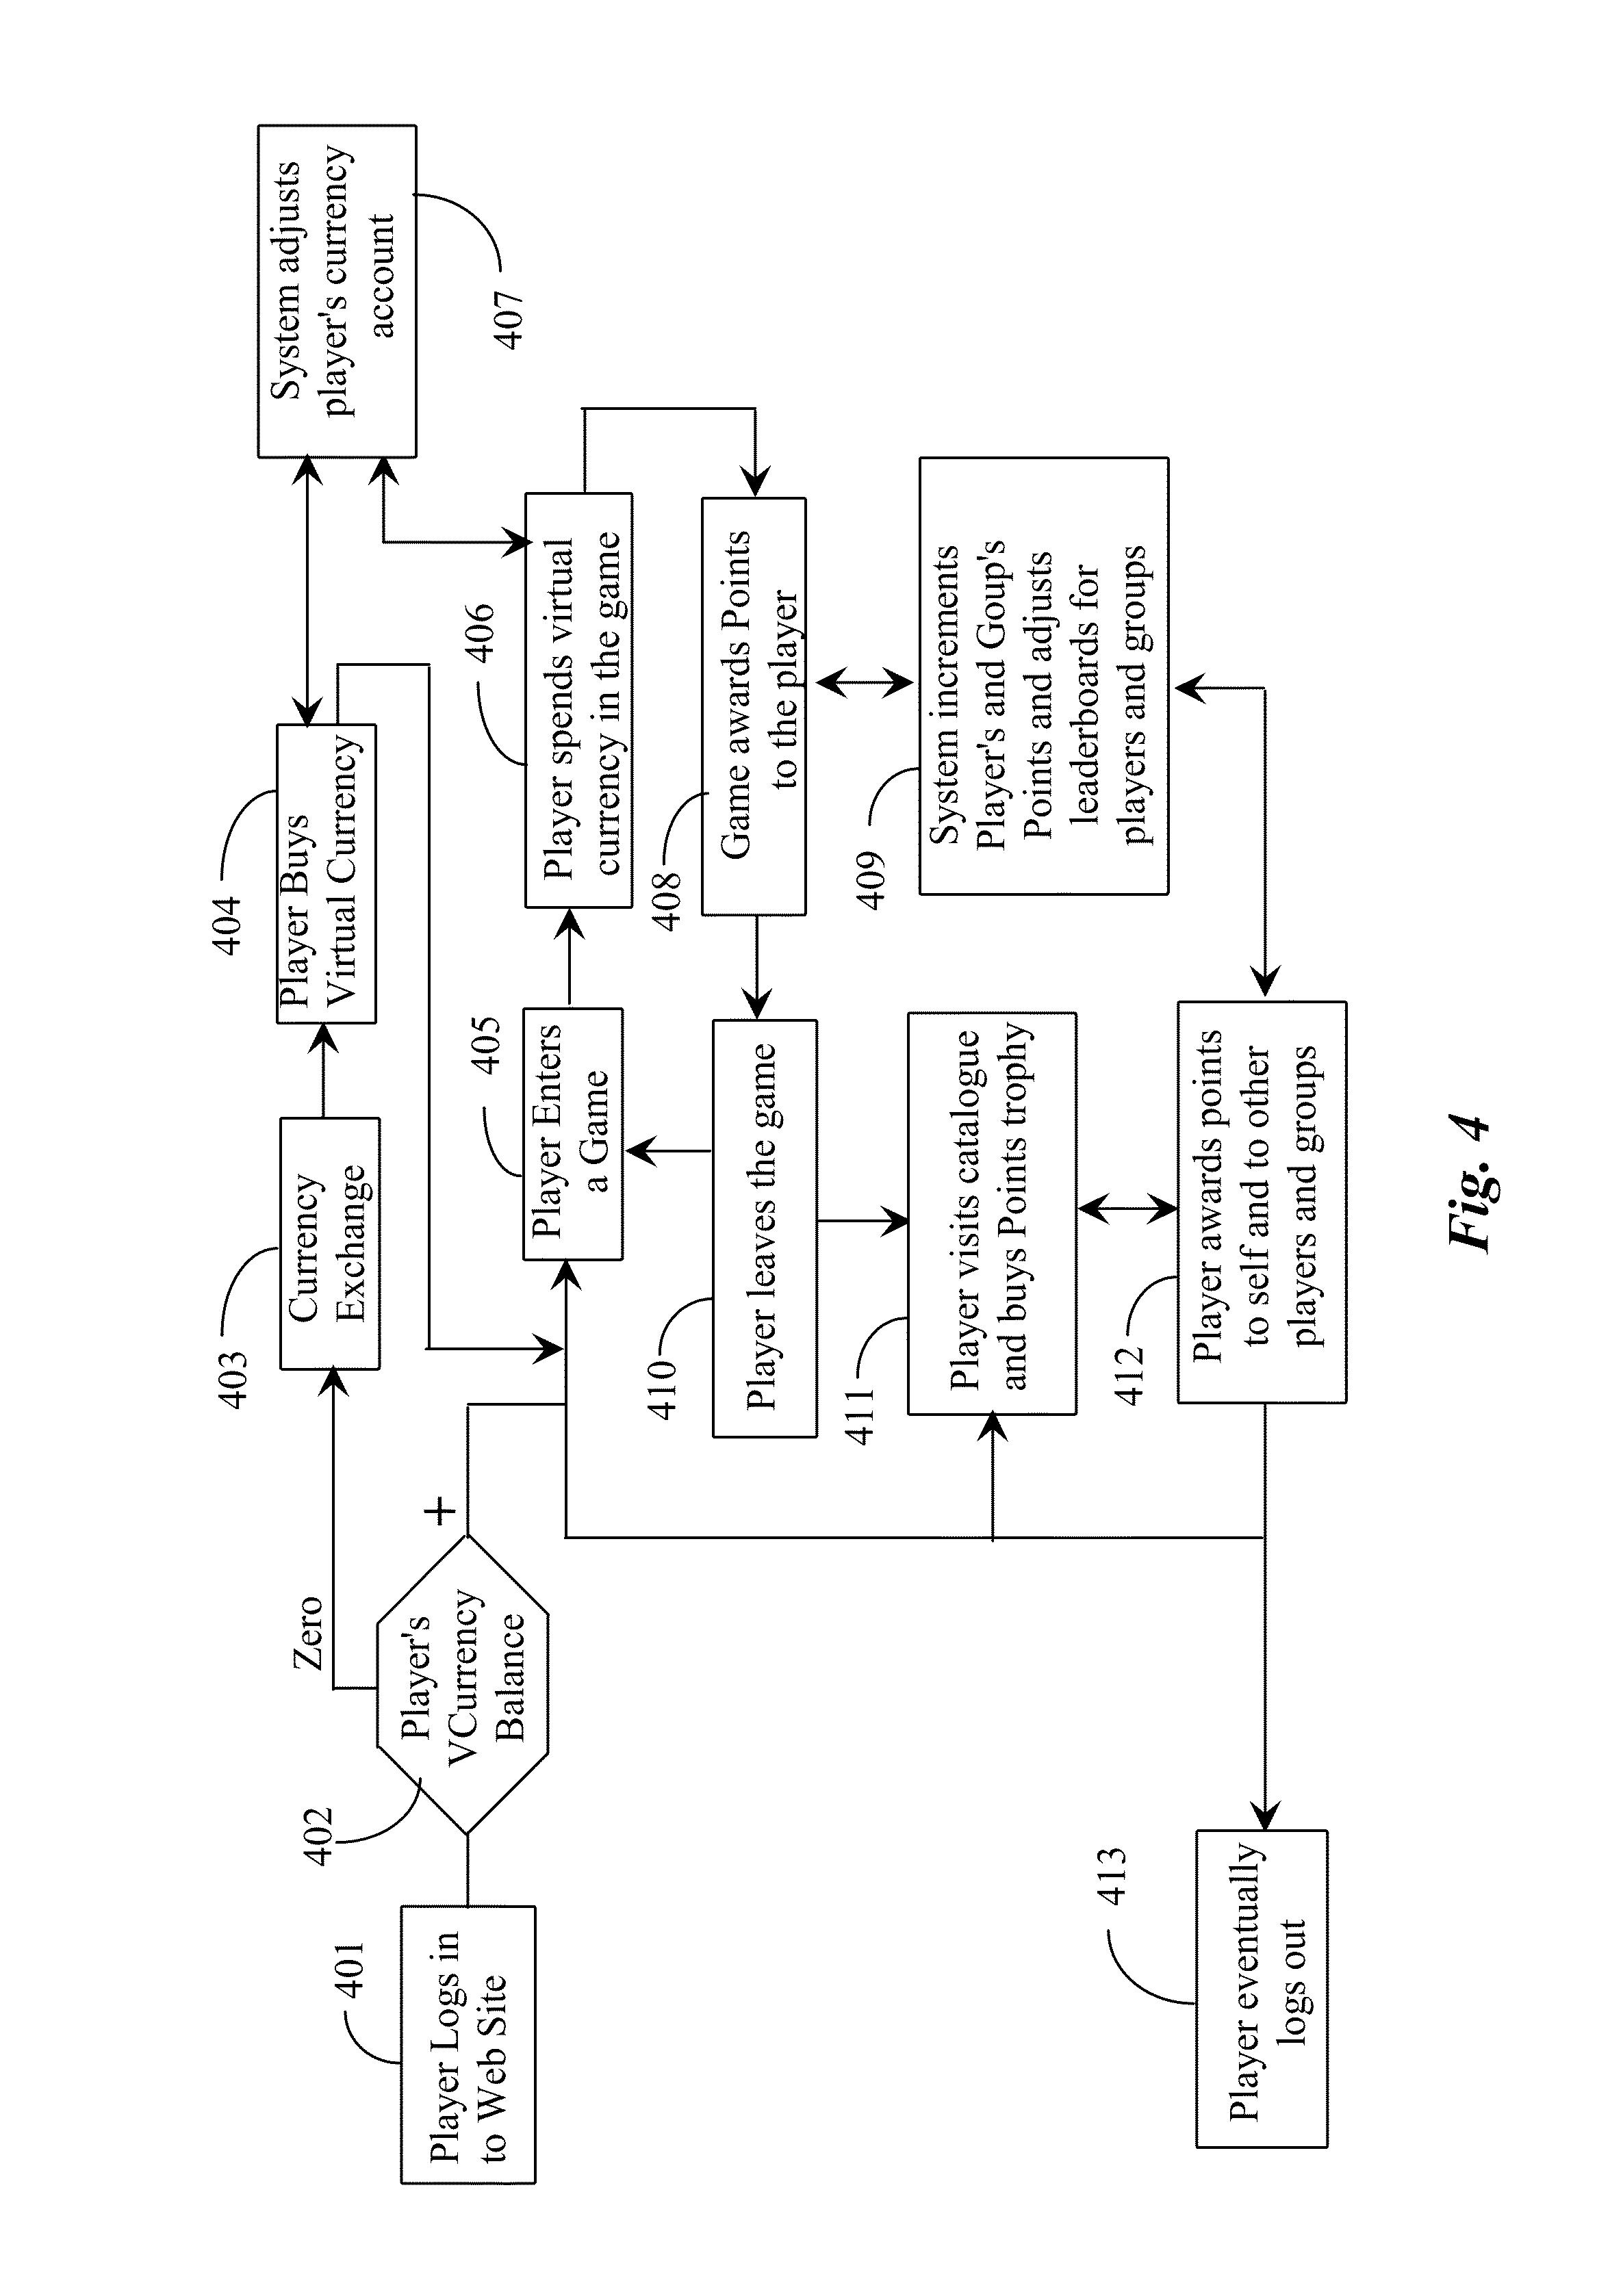 US20150265929A1 - Motivational Score - Google Patents